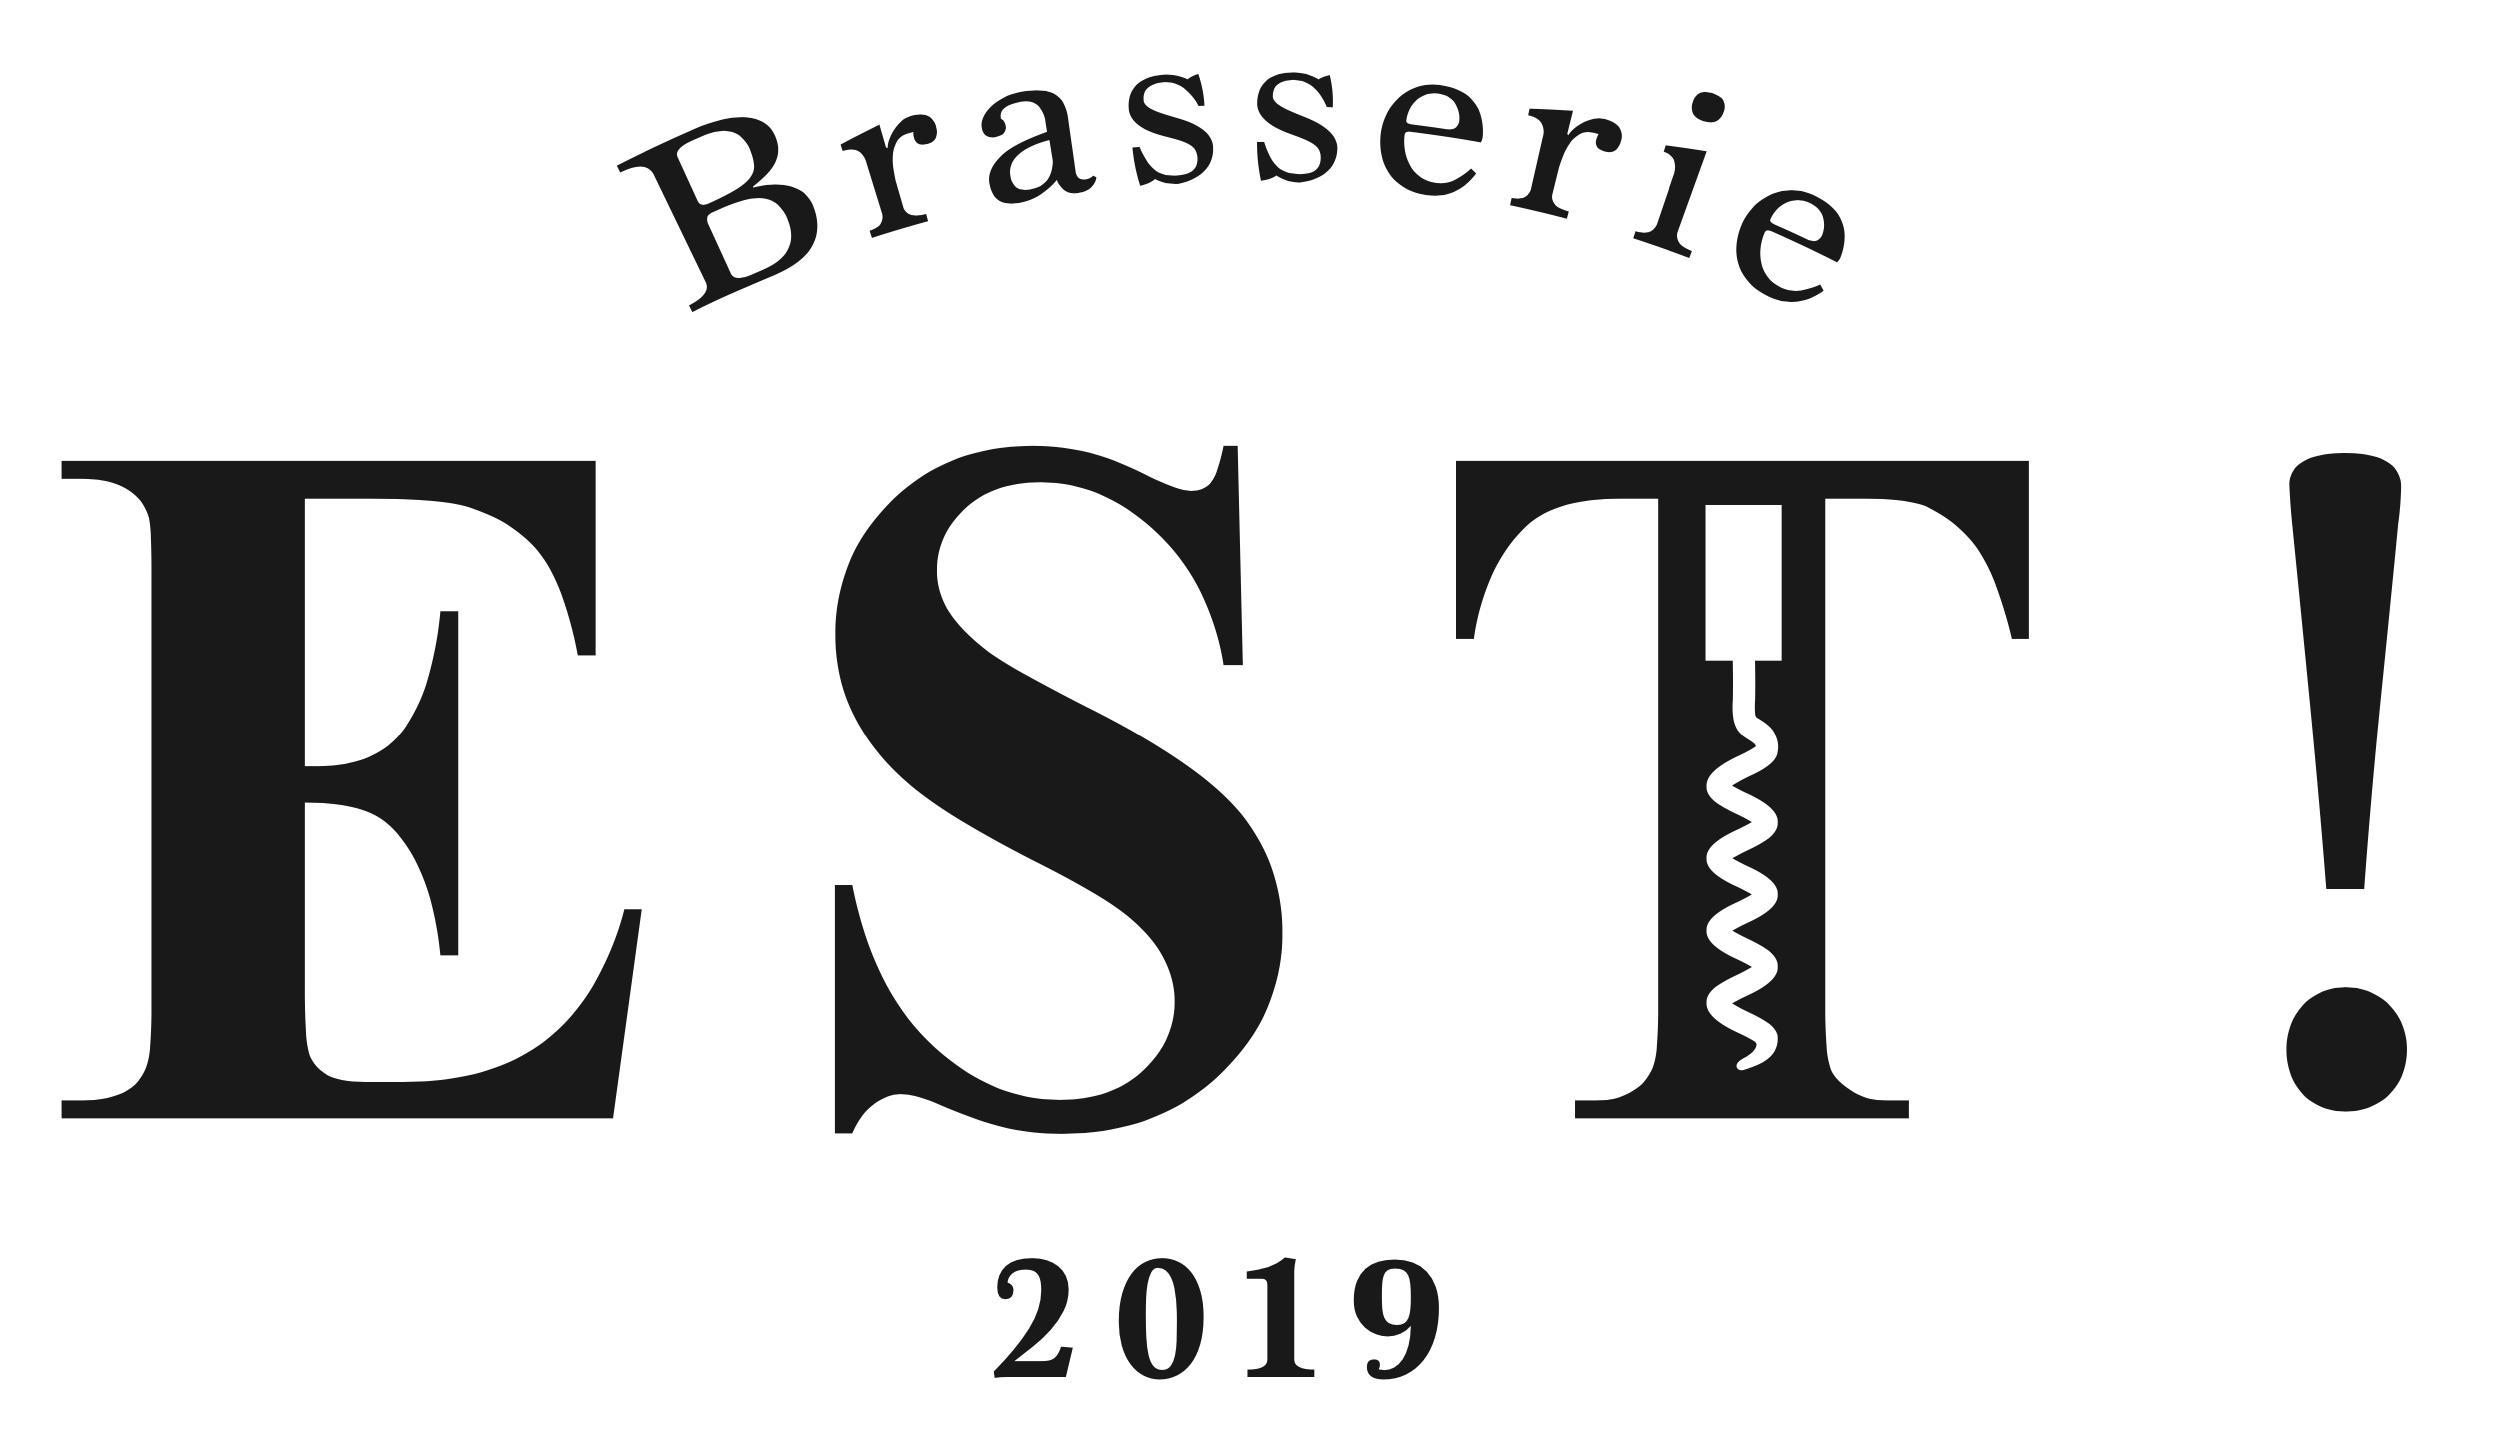 Brasserie EST !/ブラッスリー エスト!